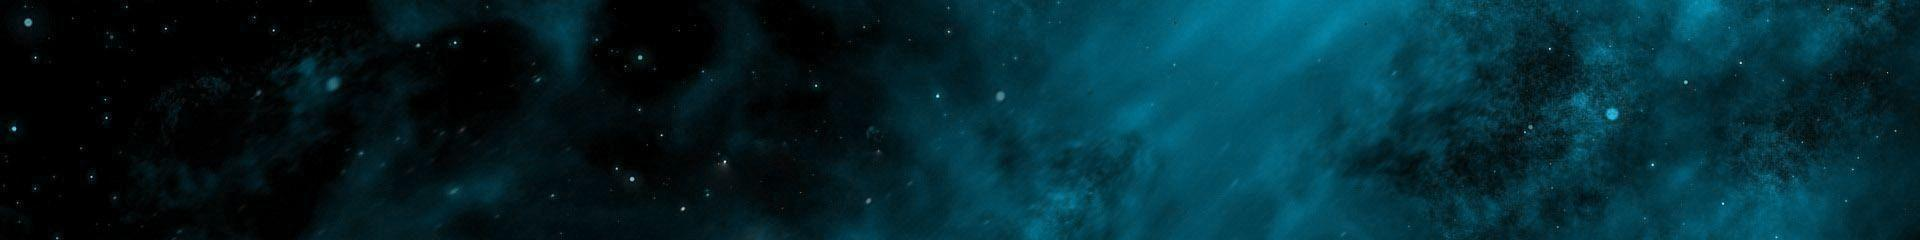 vesmír, azurový pruh